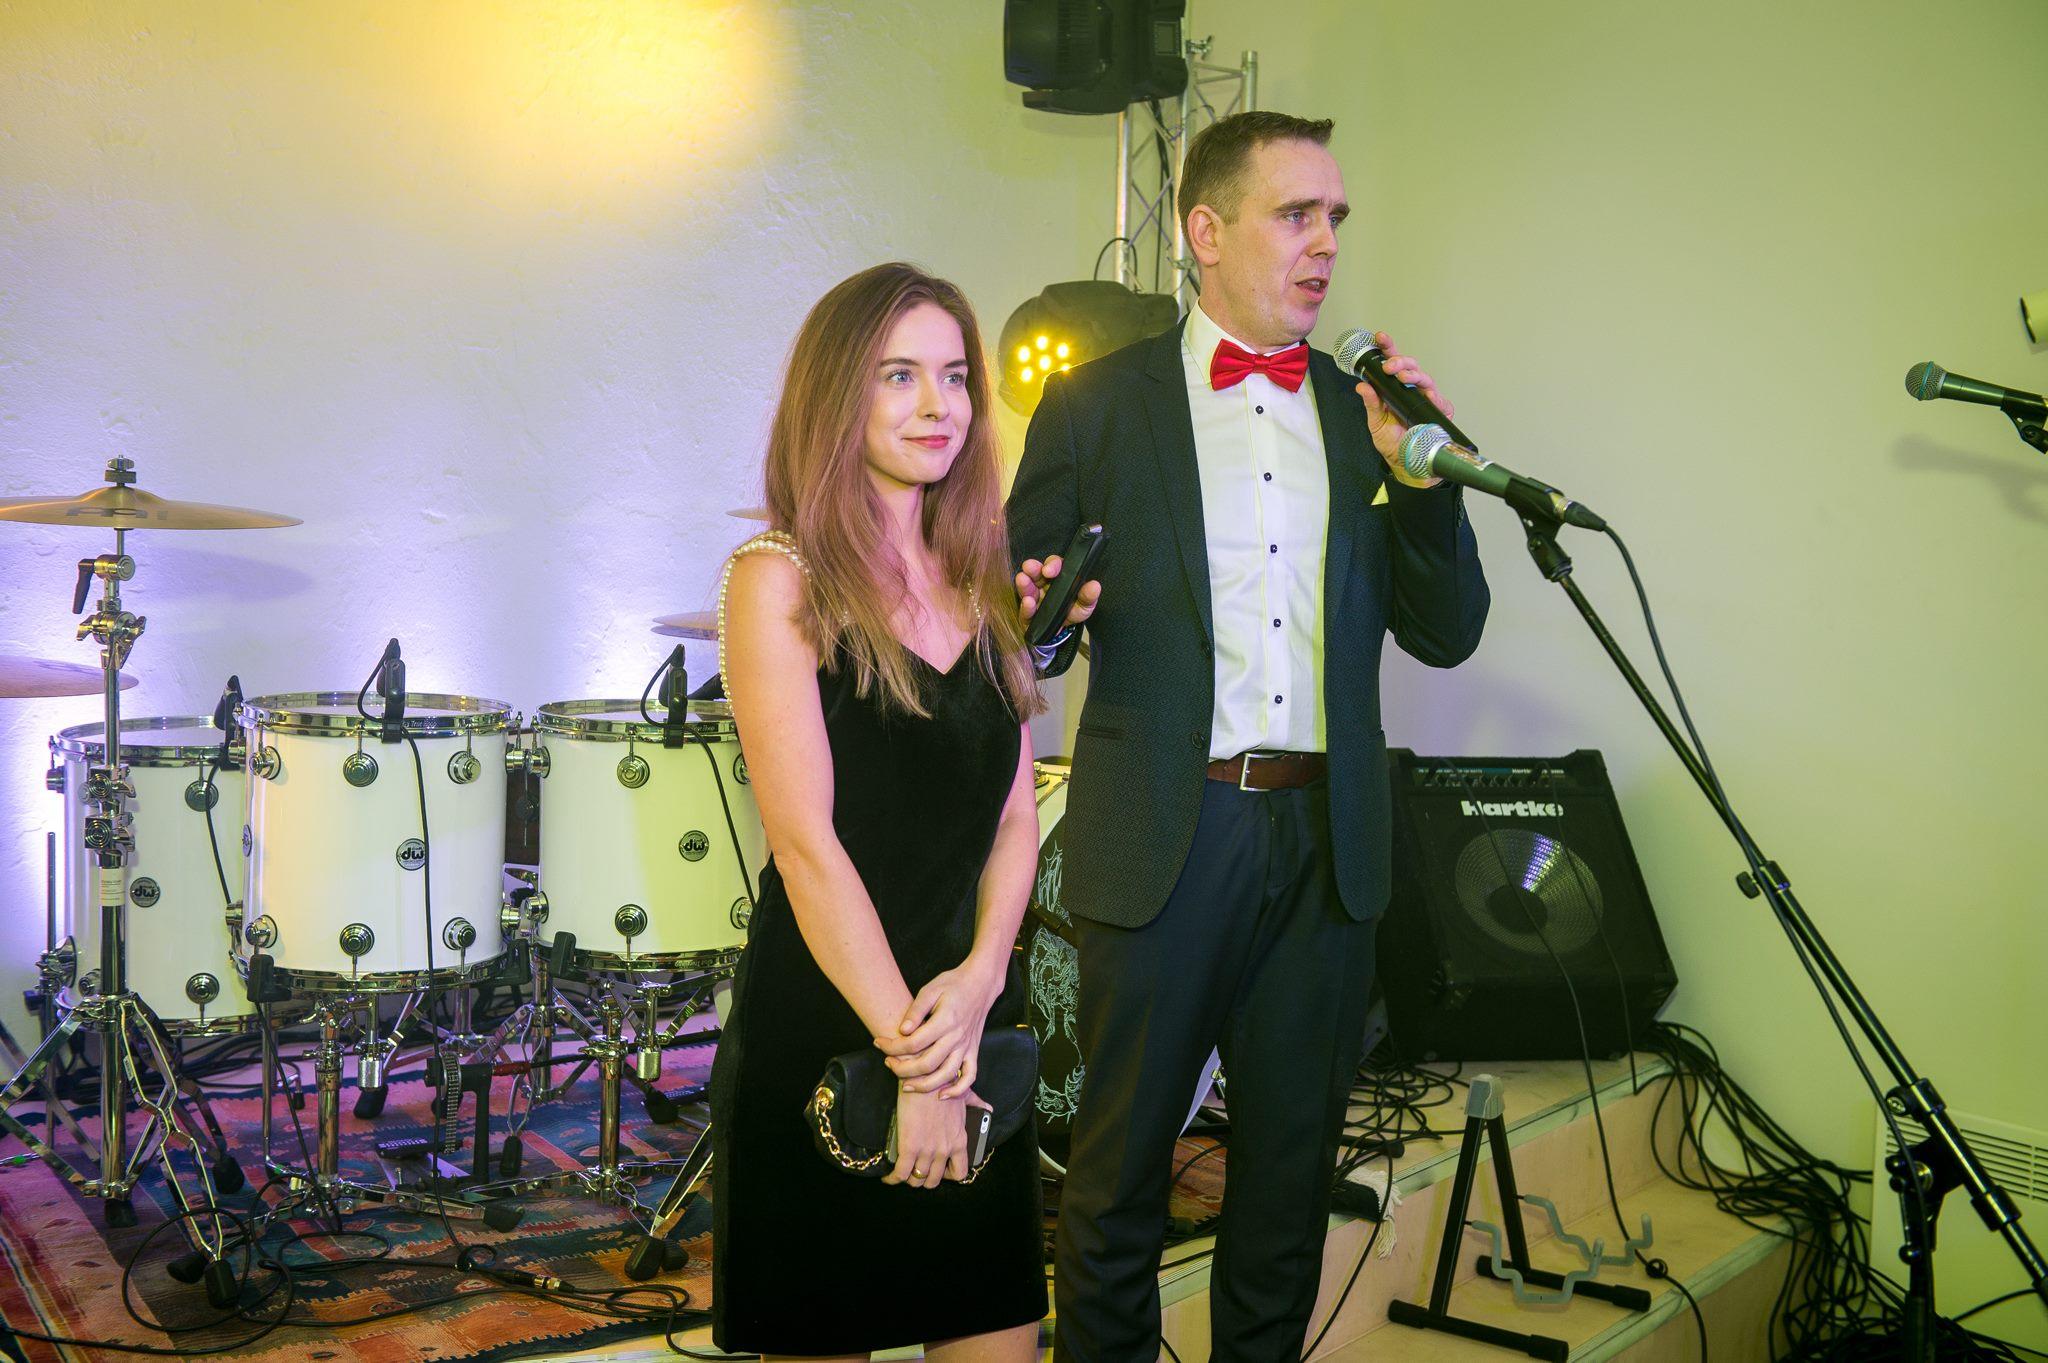 Ragnar Sass and Karina Univer